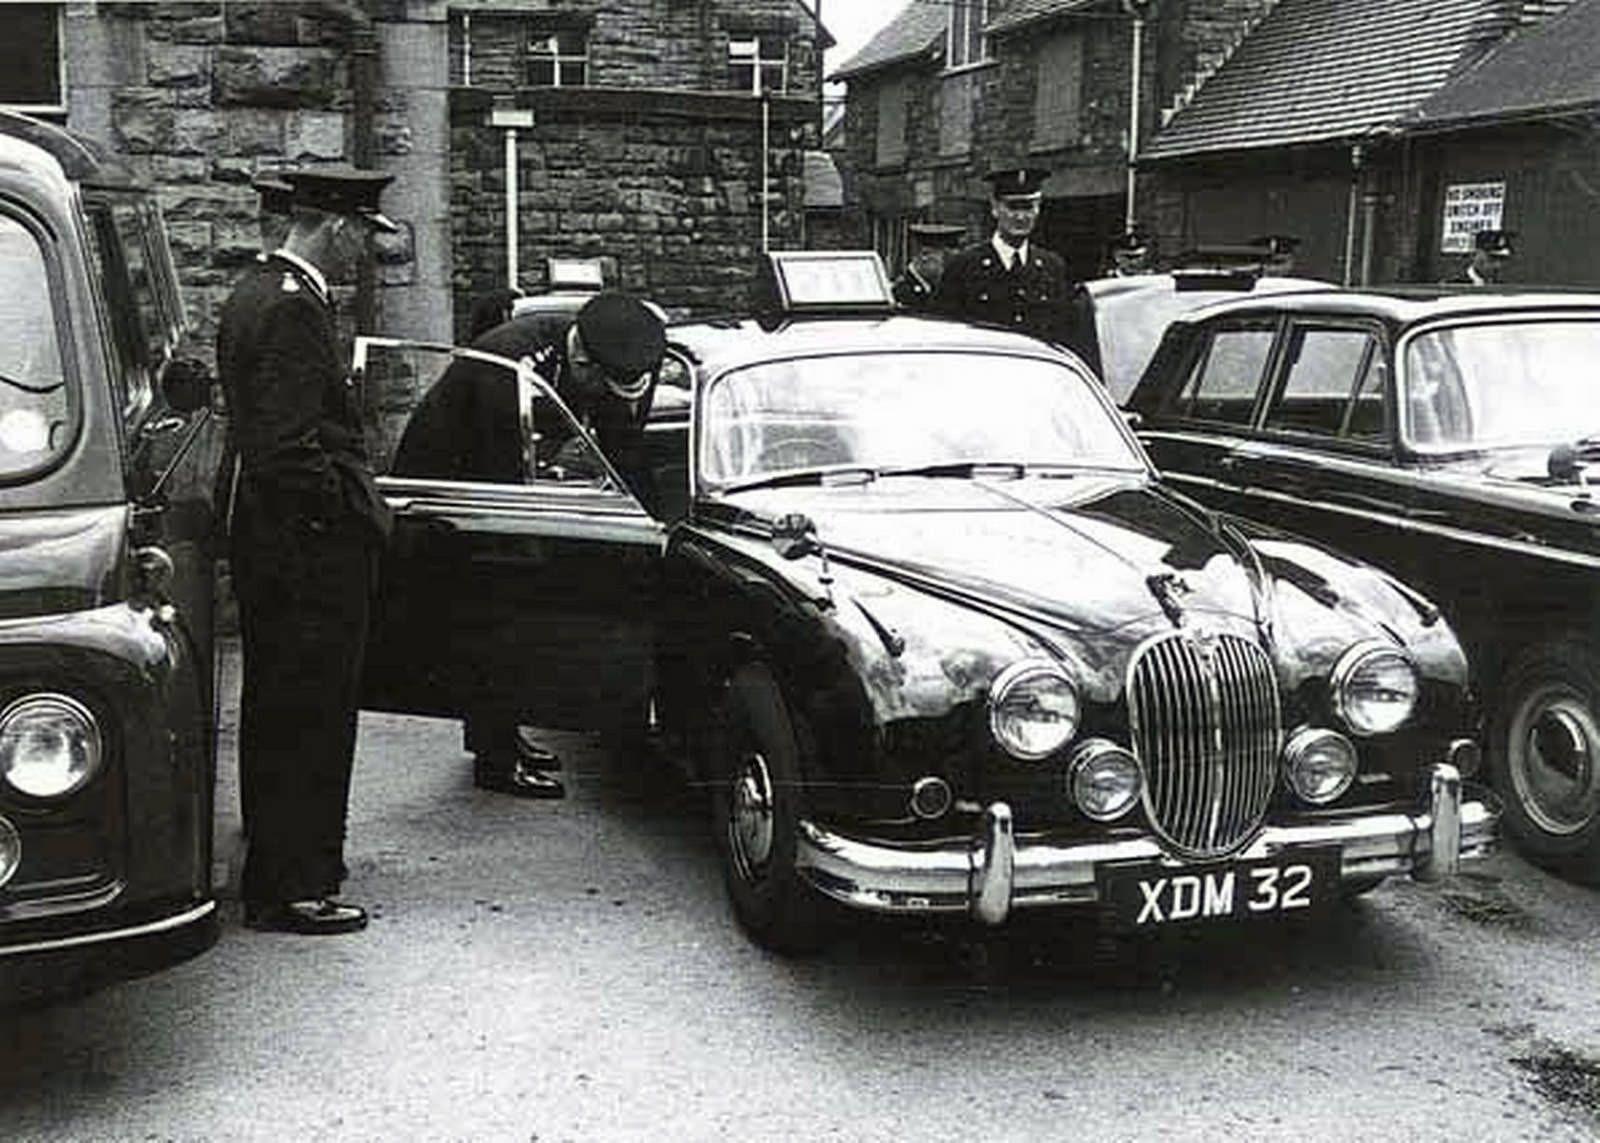 Classic British police cars, MK2 Jaguar British police